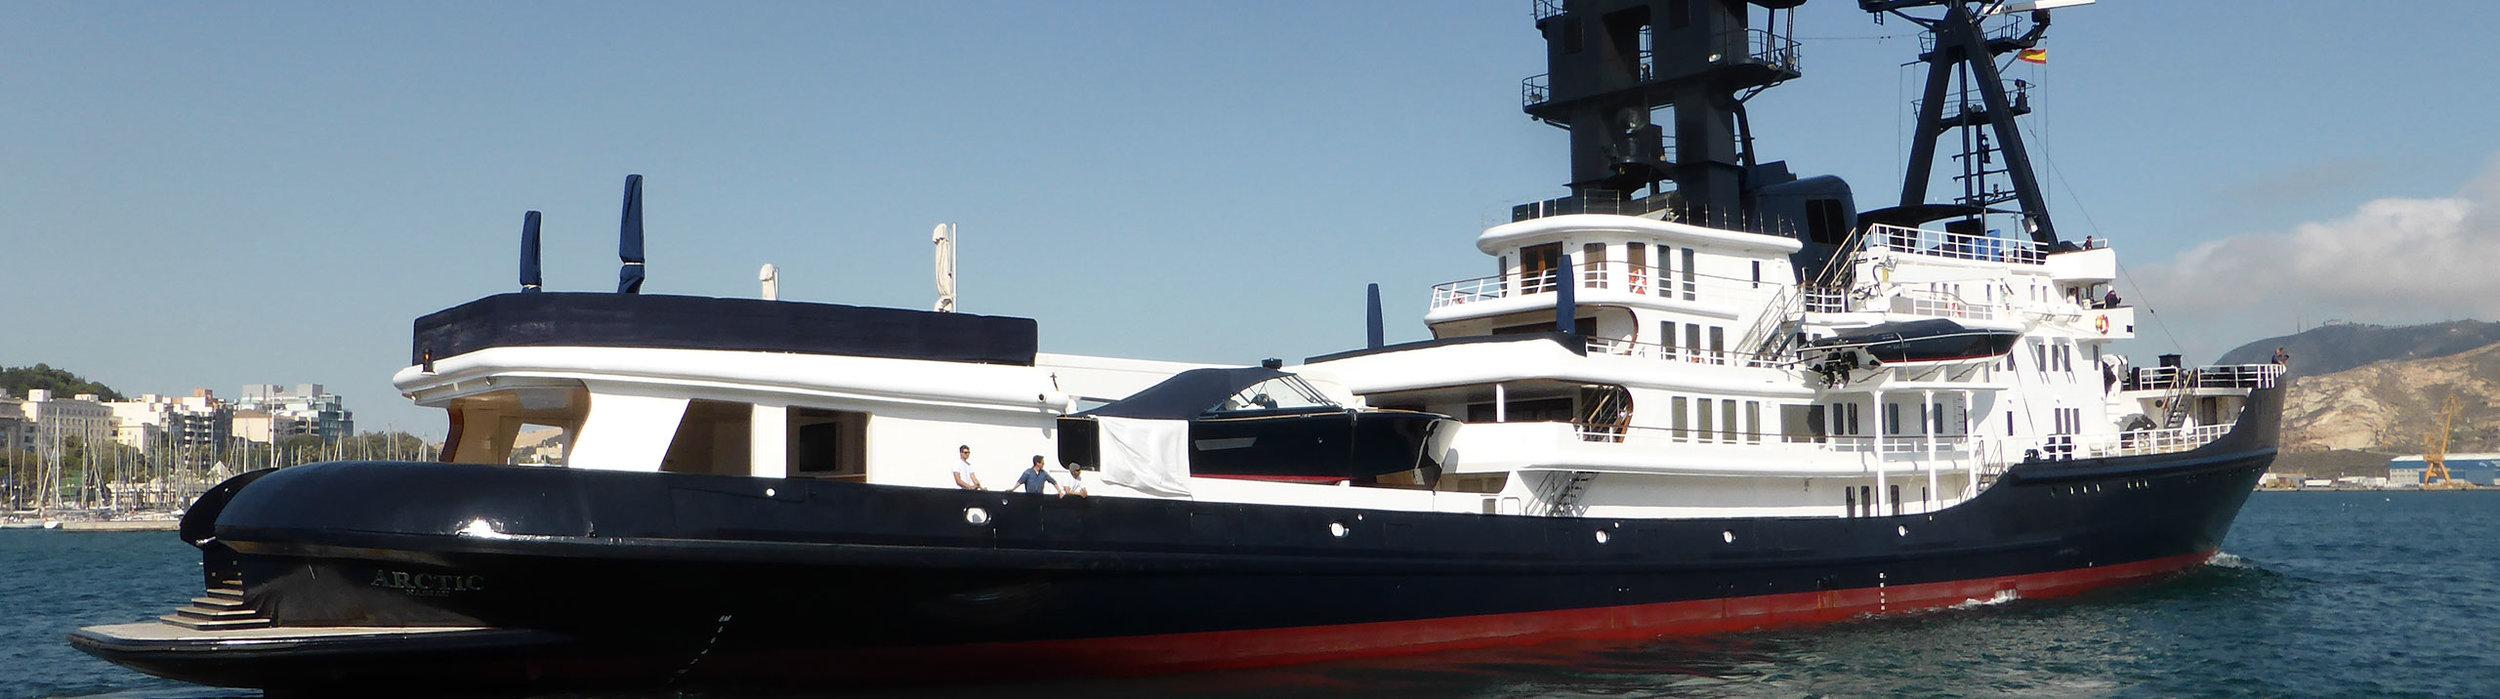 Superyacht03.jpg